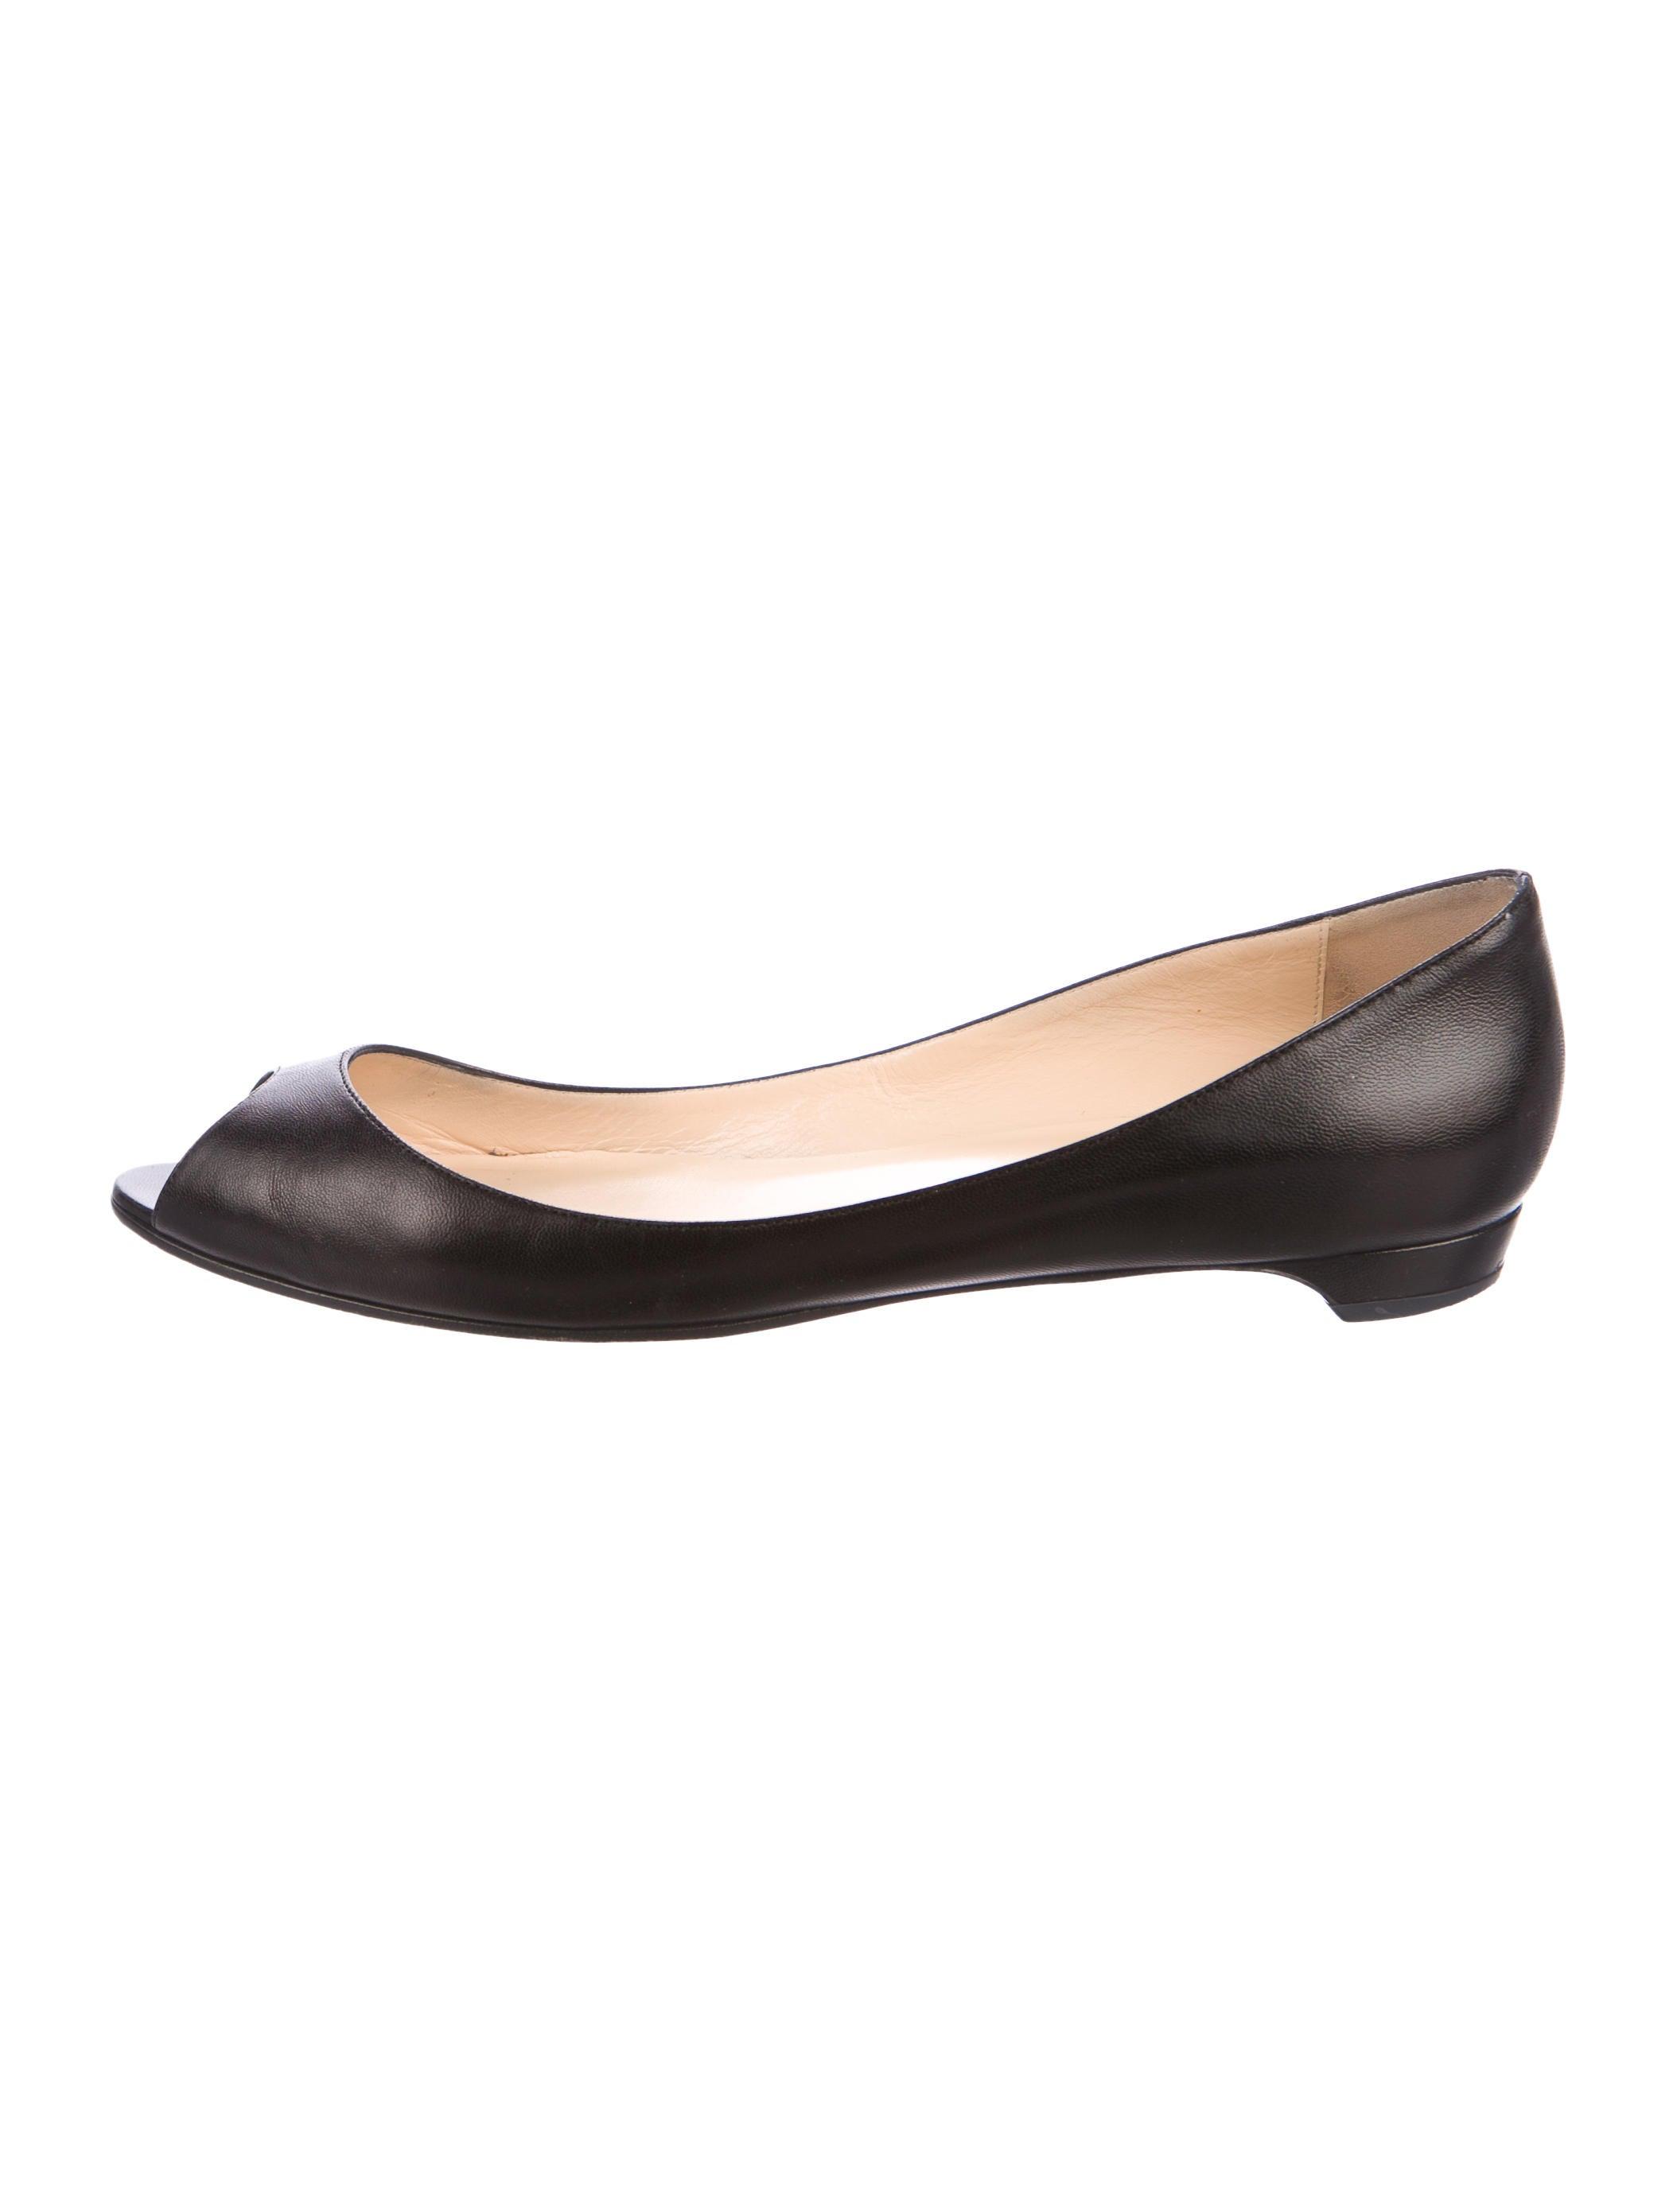 00b30e770ee4 Christian Louboutin Mumbai Peep-Toe Flats - Shoes - CHT86389